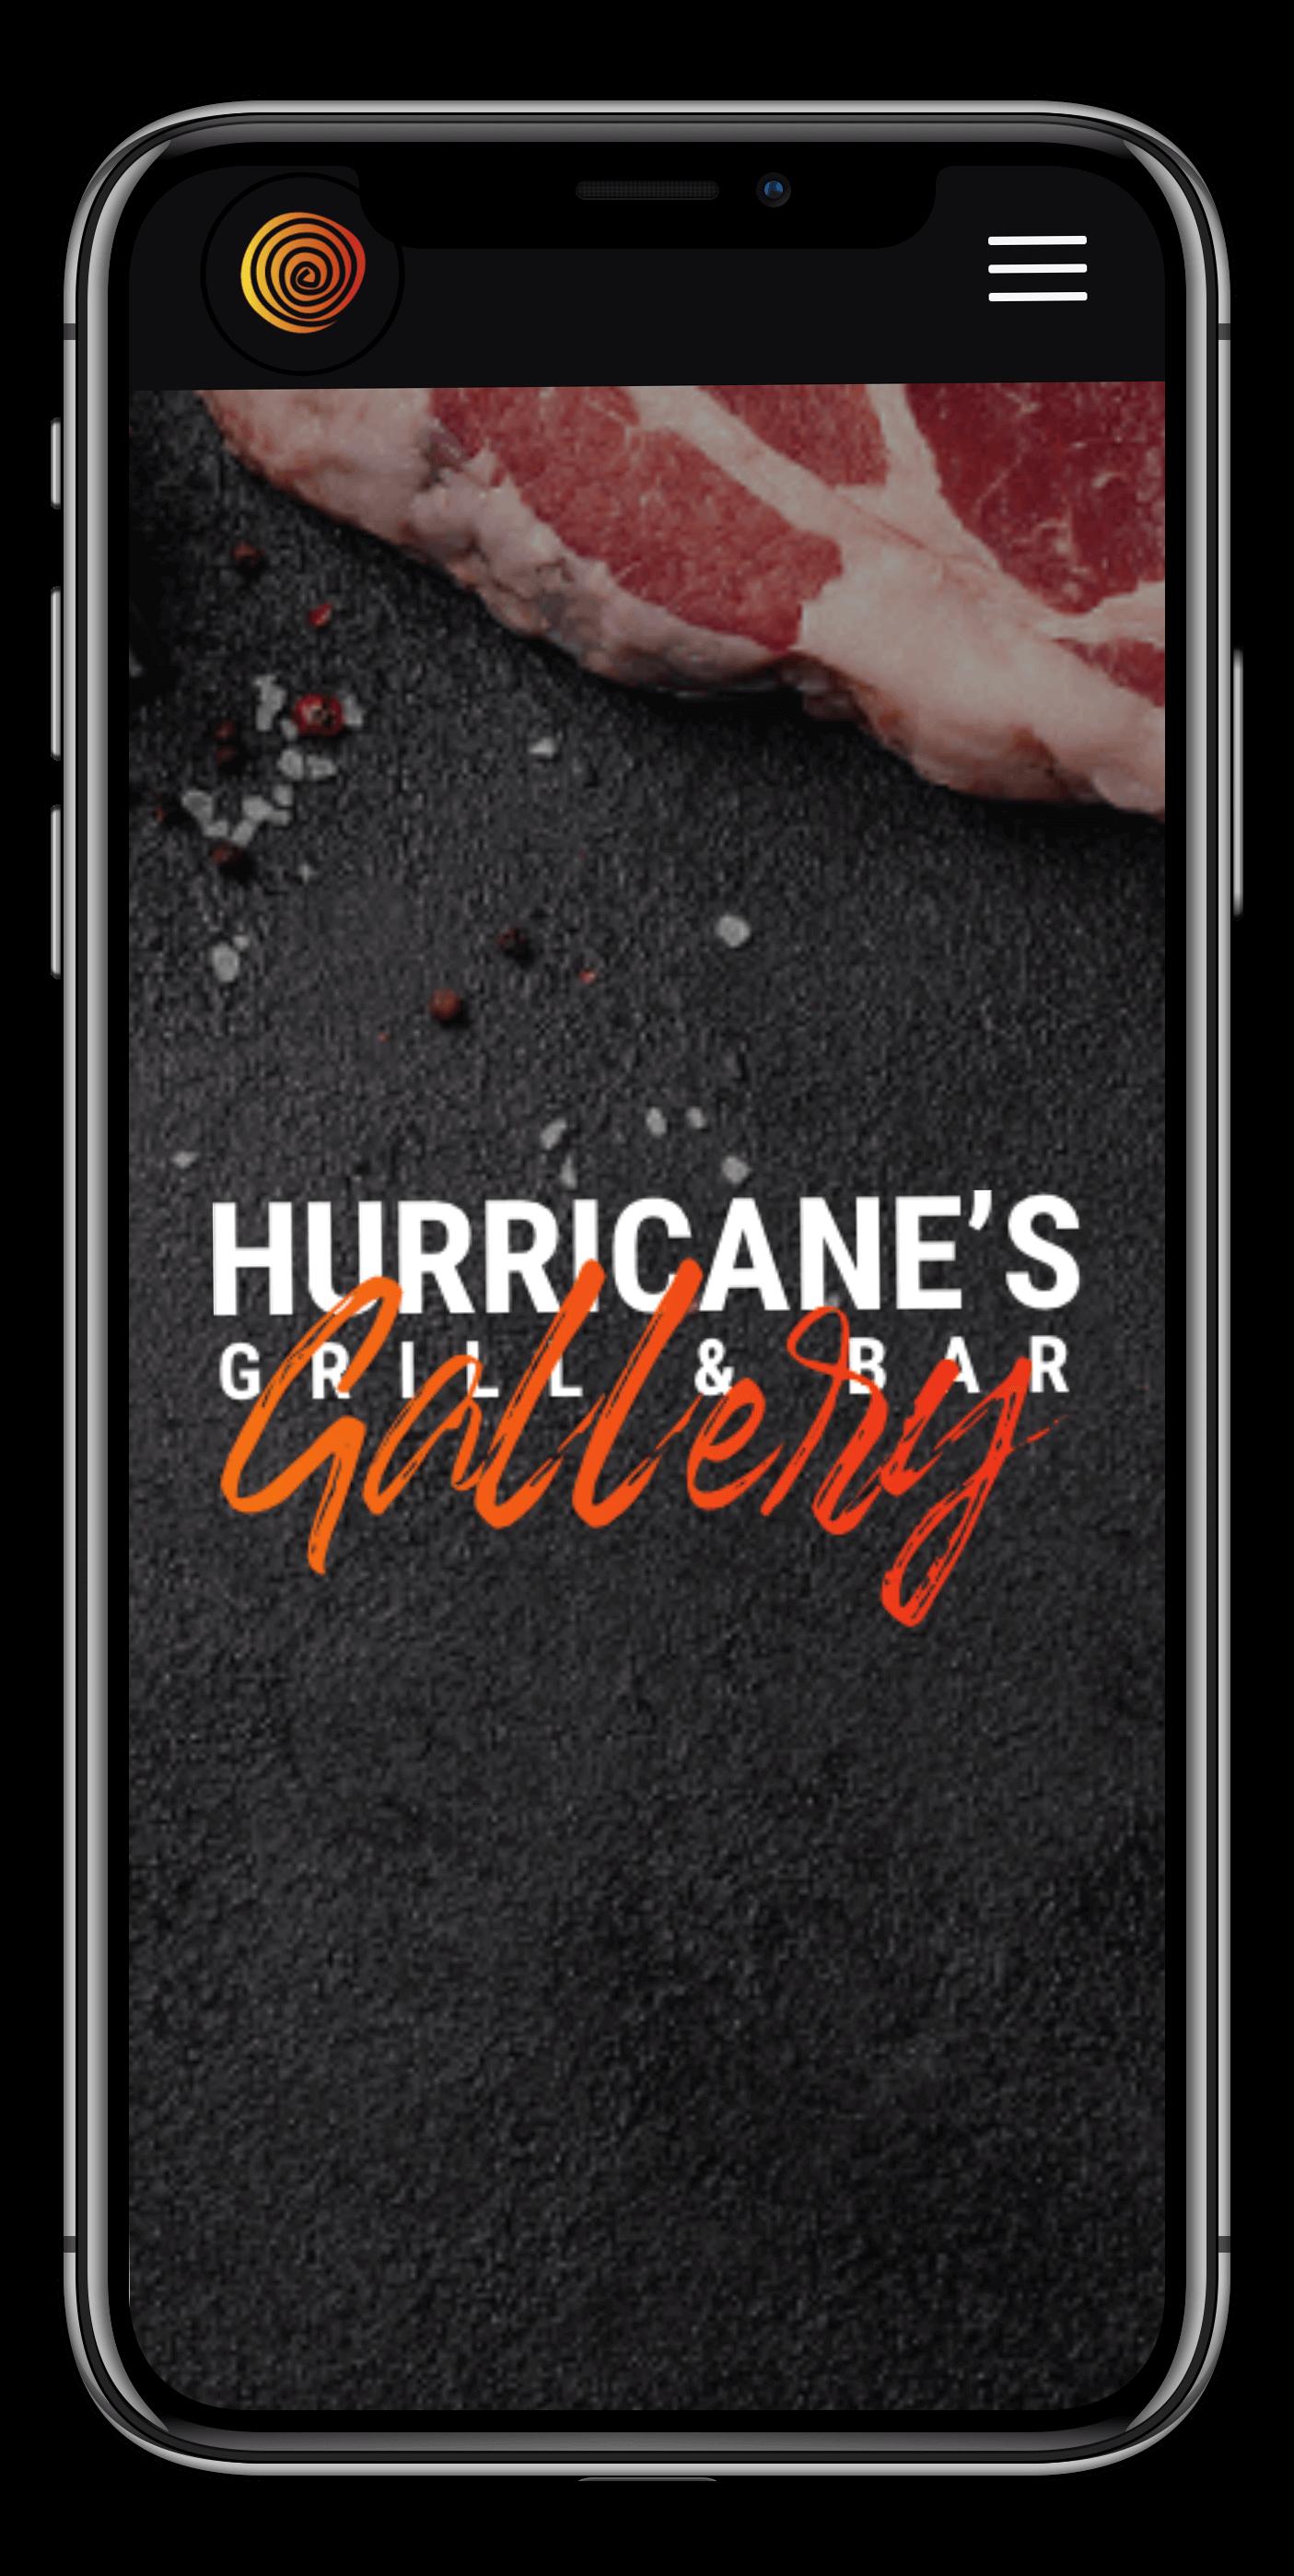 sydney-website-design-agency-hurricanes_iphon2